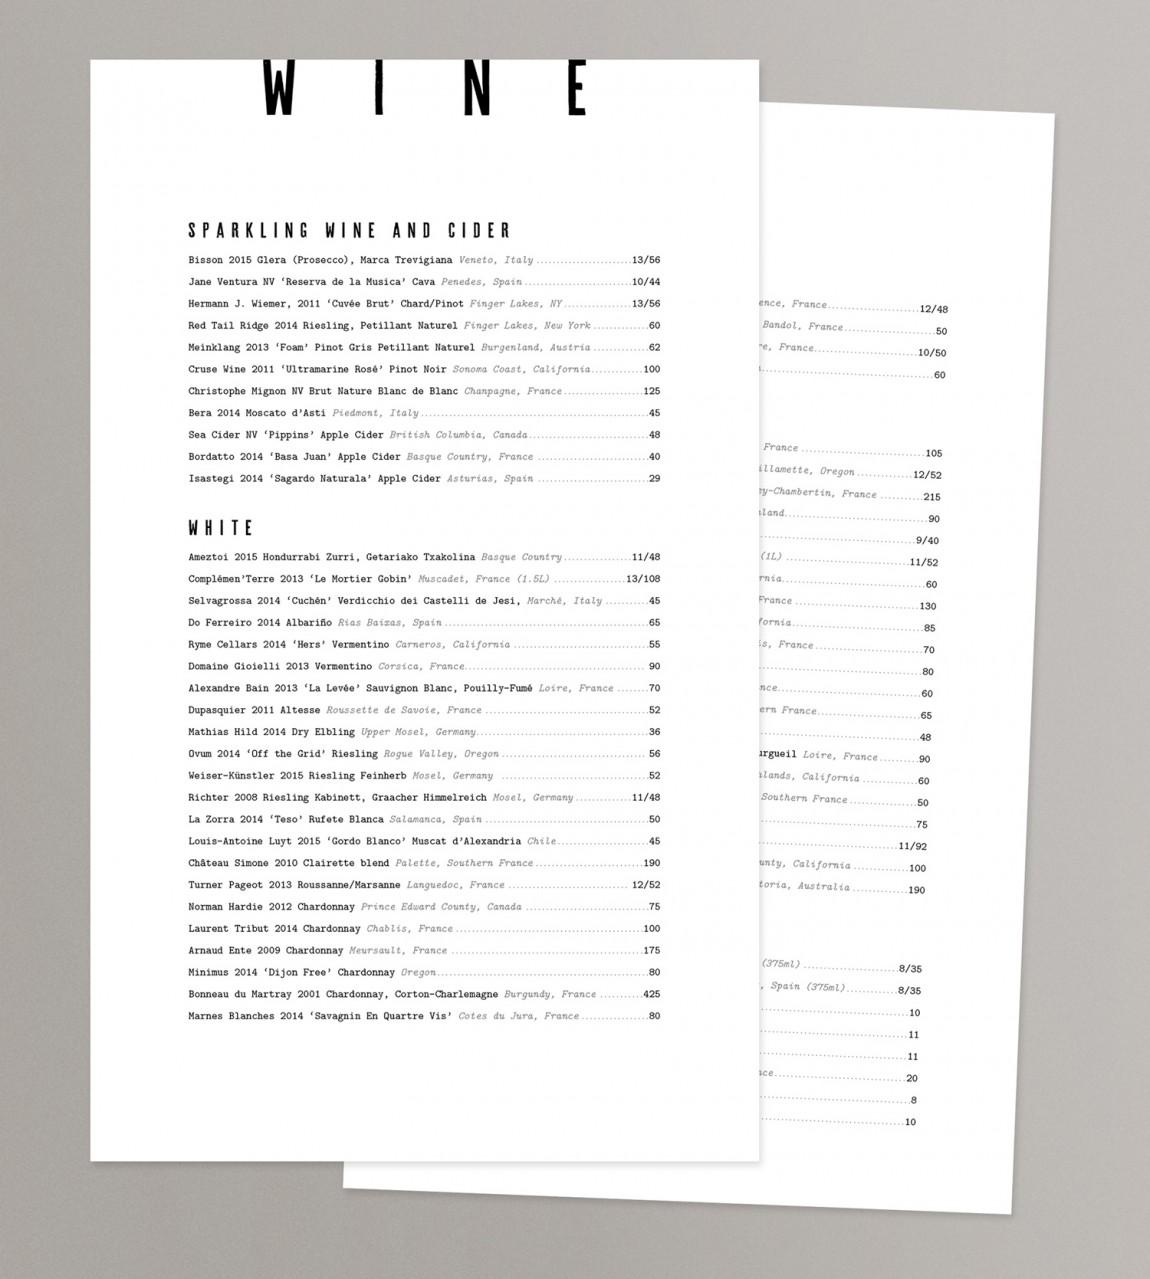 Giant概念餐厅品牌设计, 菜单设计